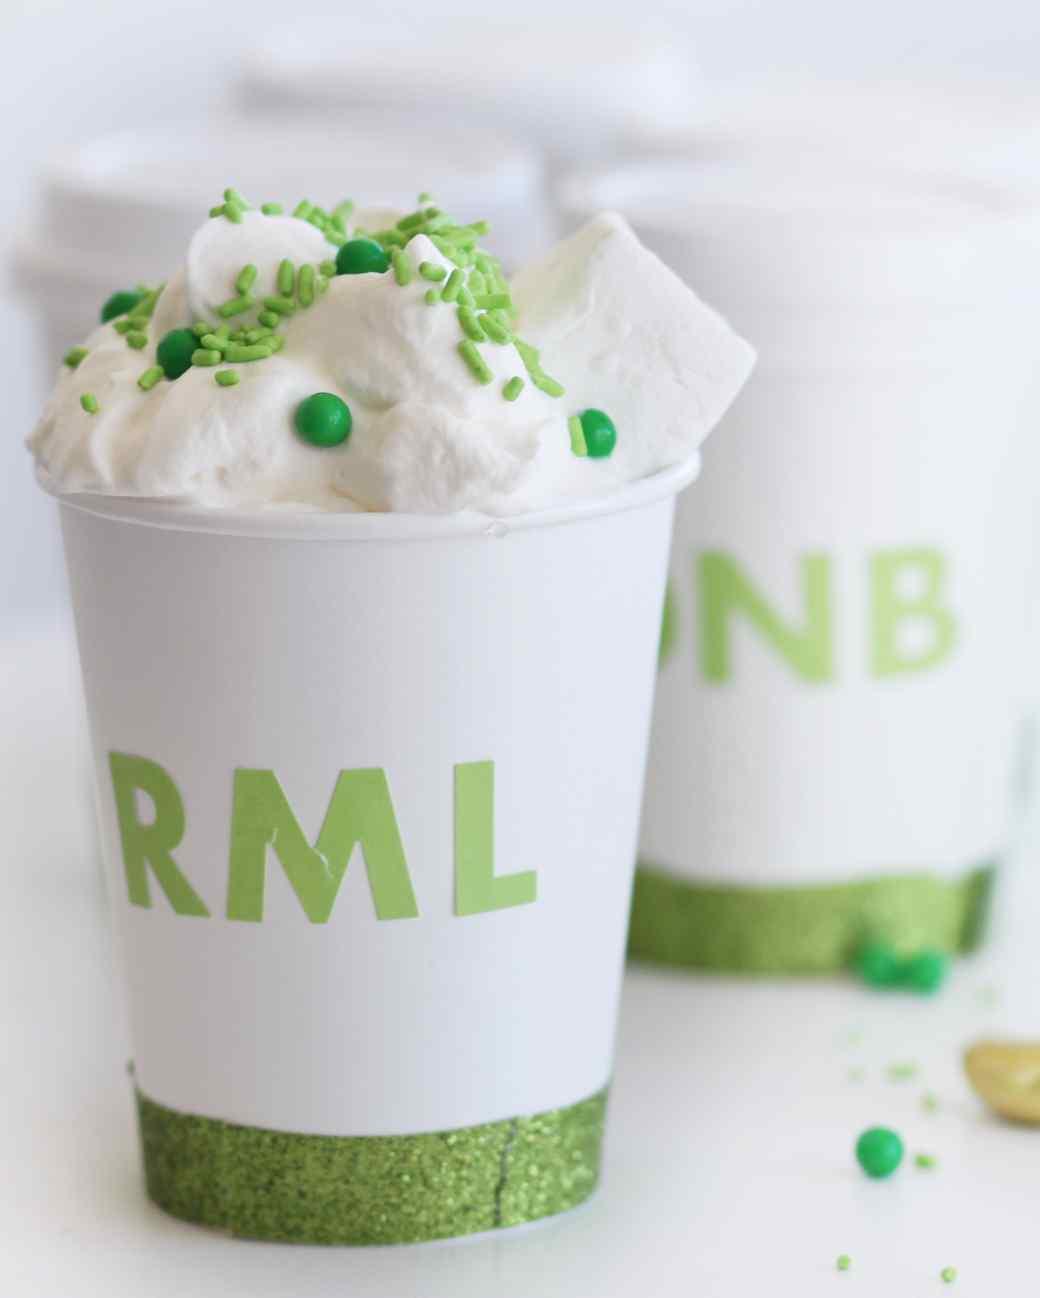 St. Patrick's Day Irish coffee cup-to-go